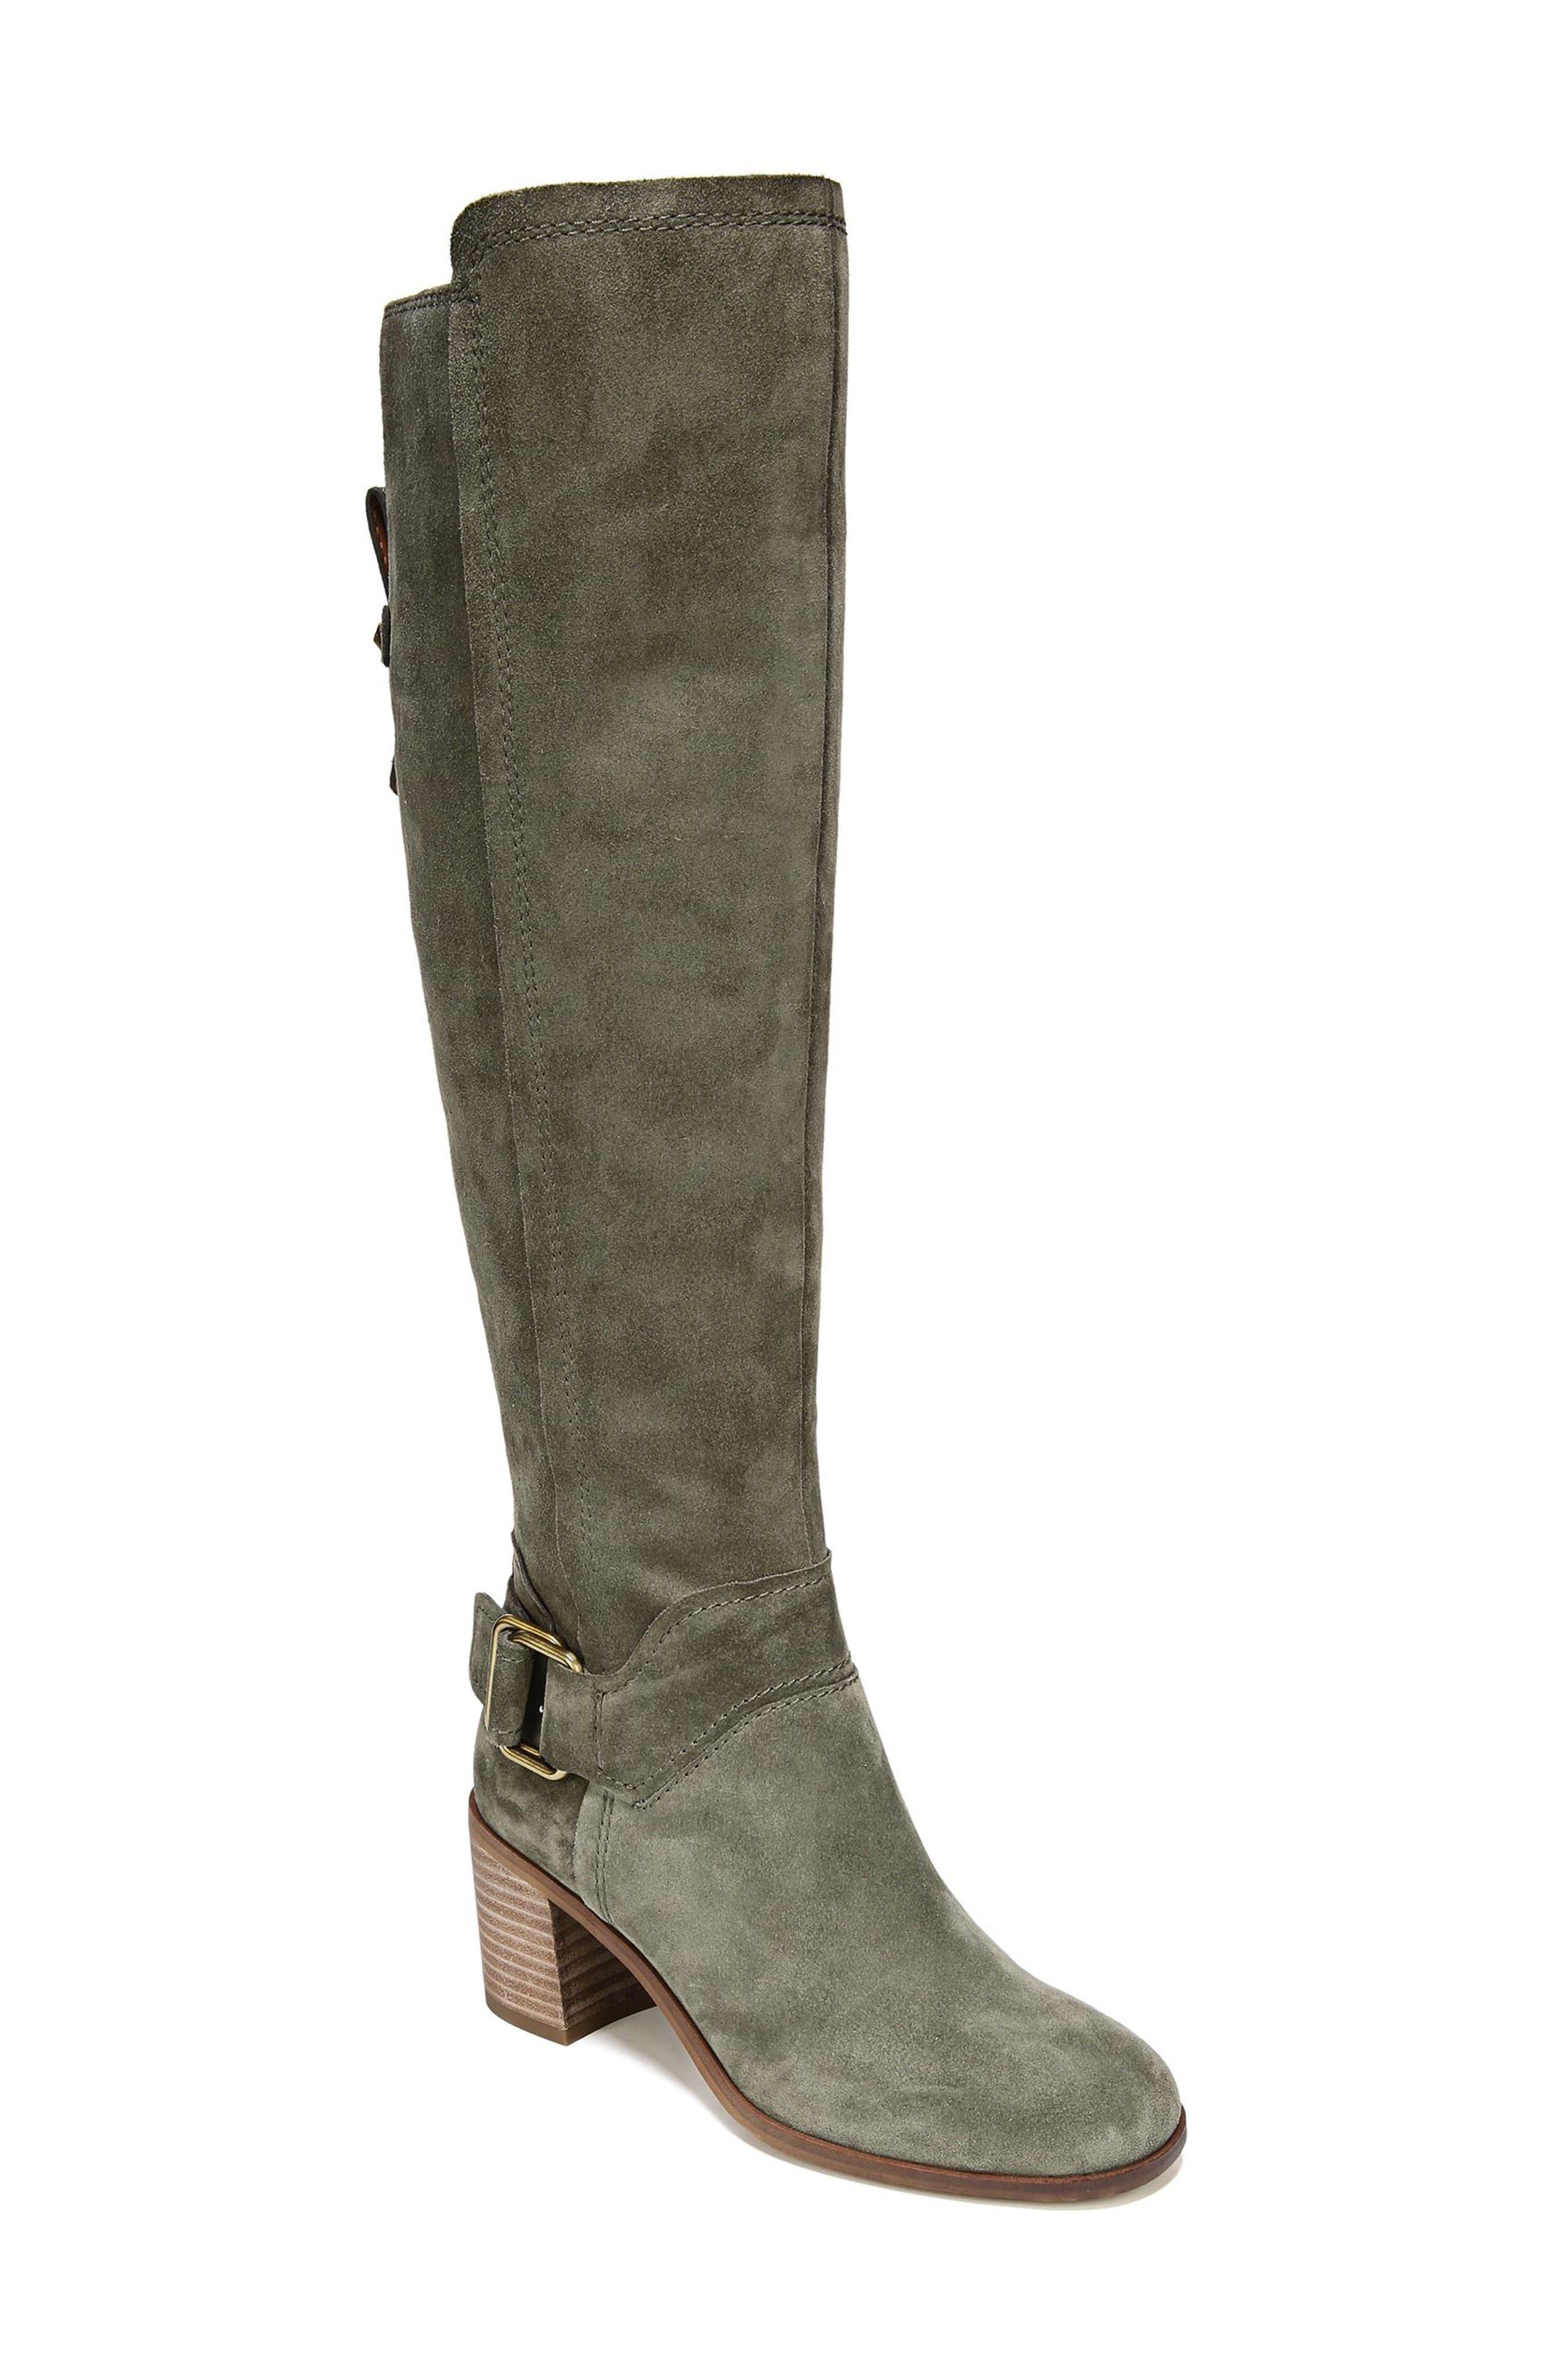 Alternate Image 1 Selected - SARTO by Franco Sarto Mystic Knee High Boot (Women)